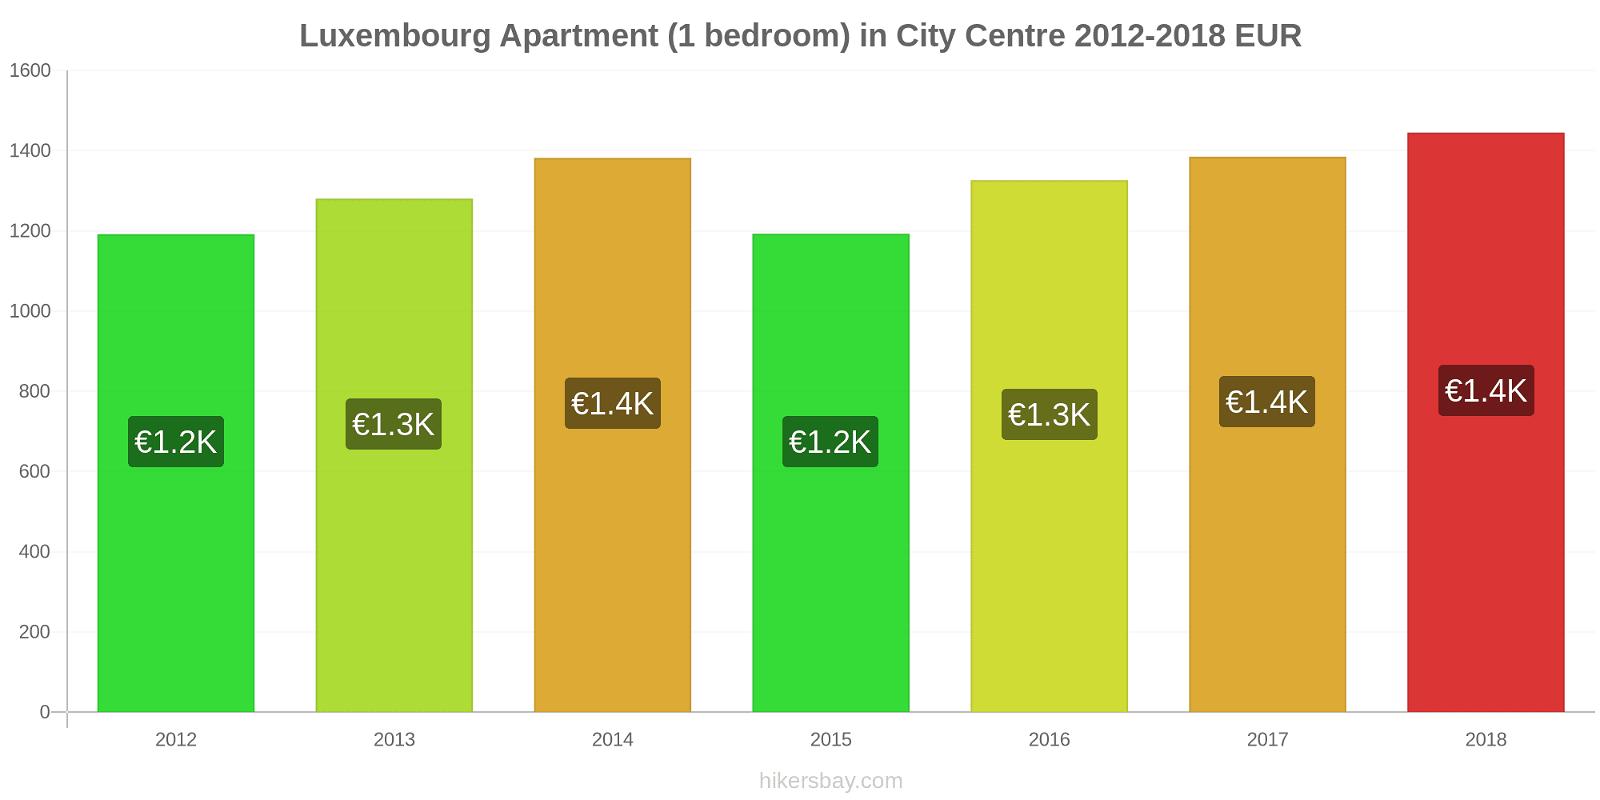 Luxembourg price changes Apartment (1 bedroom) in City Centre hikersbay.com